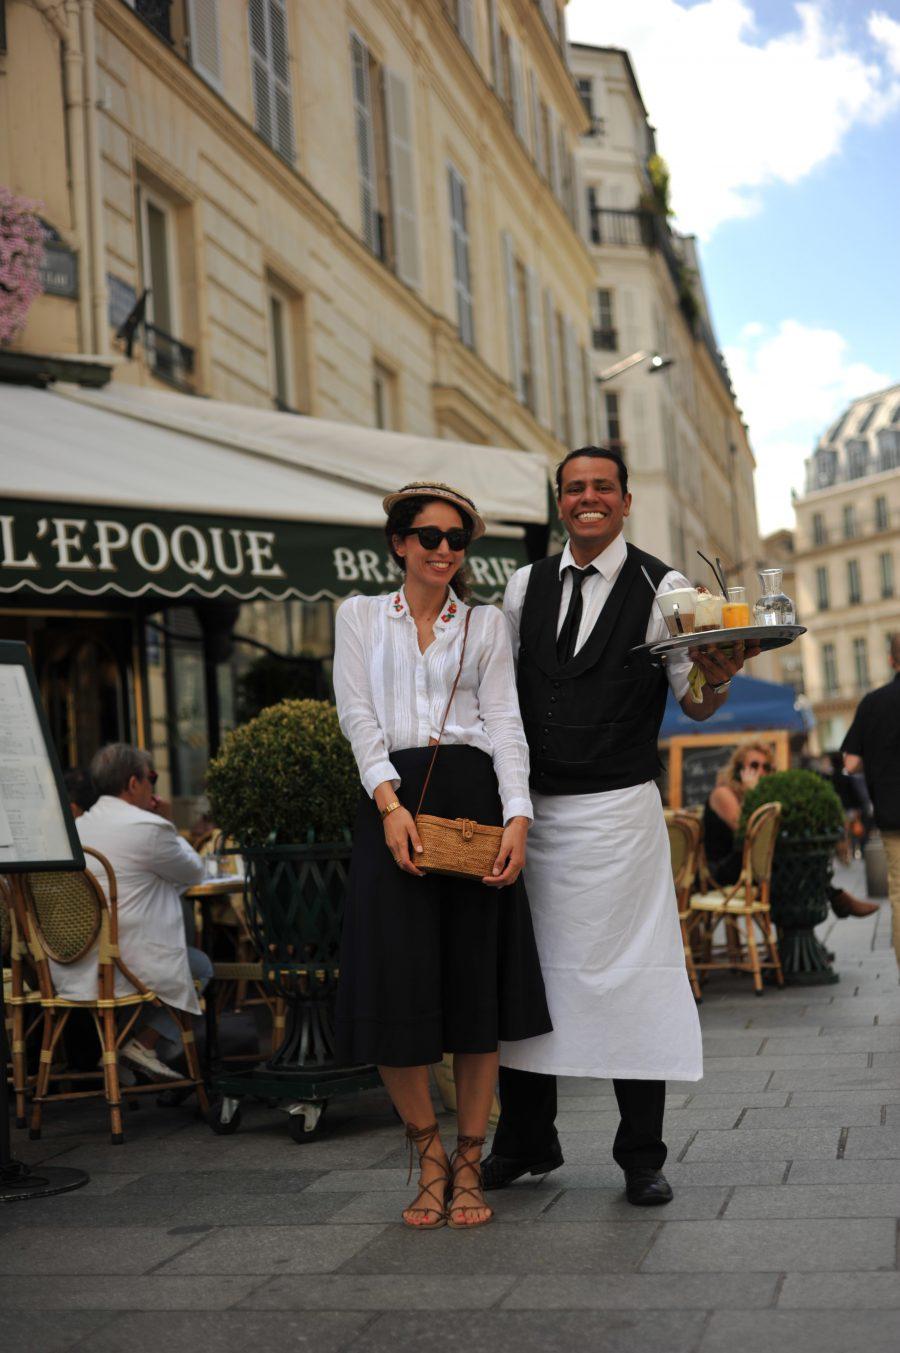 scene-parisienne-cafe-parisiens